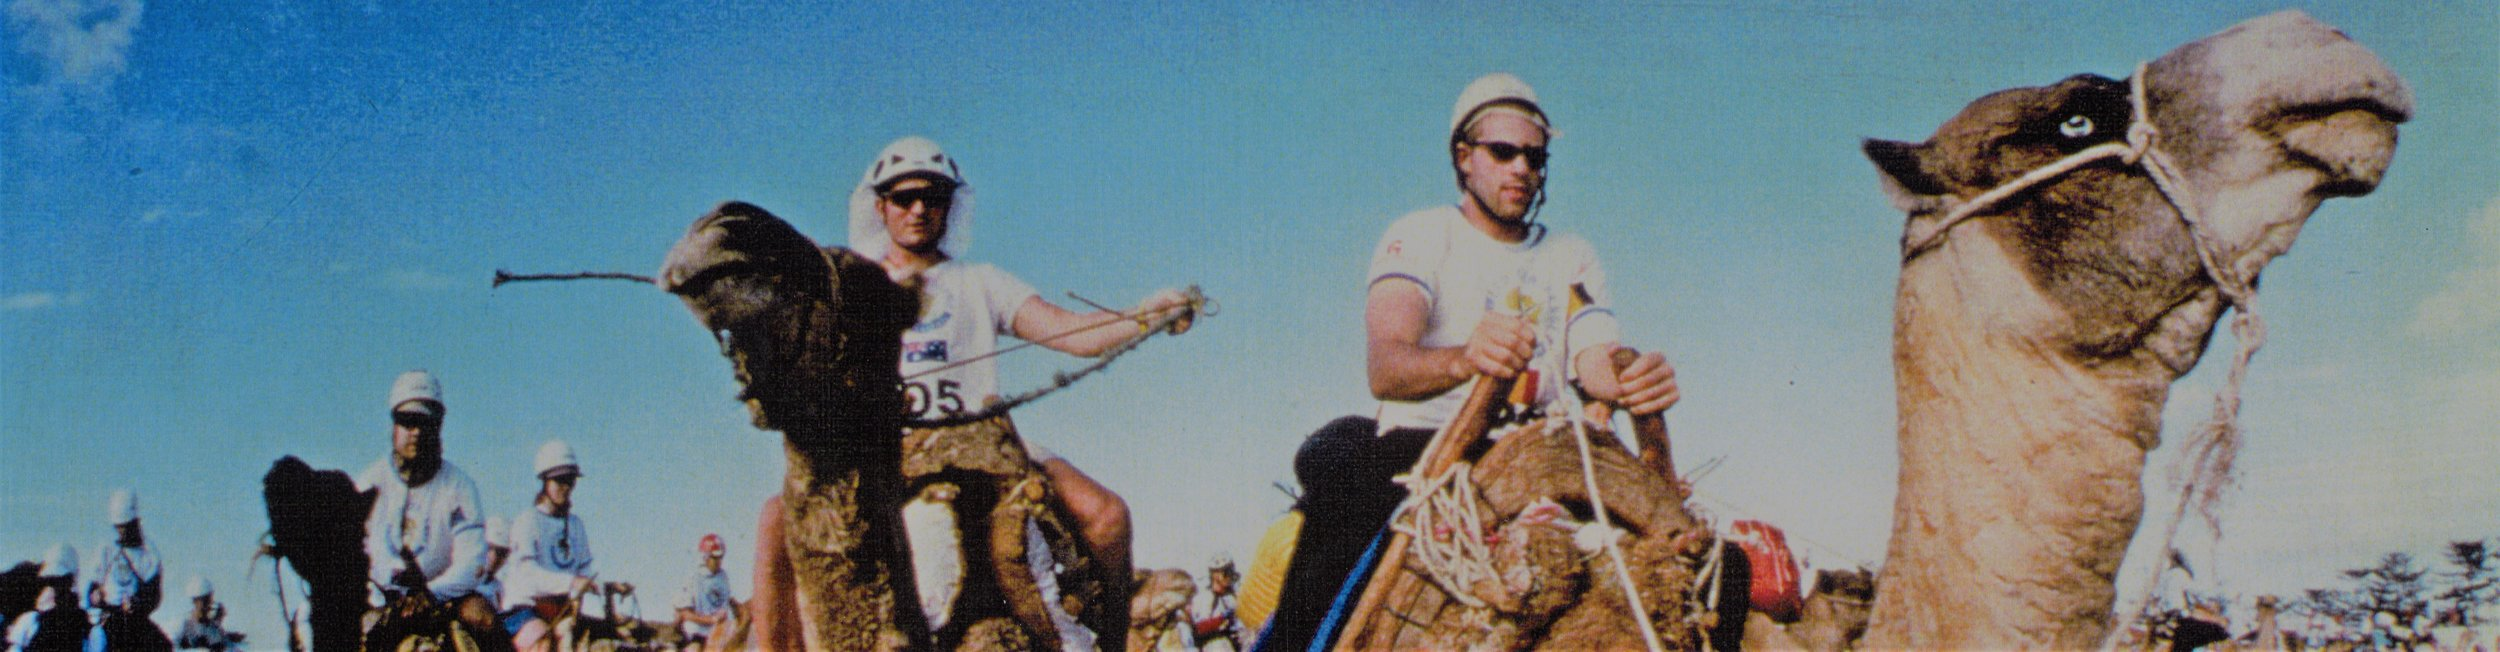 banner Eco-Challenge Morocco.jpg